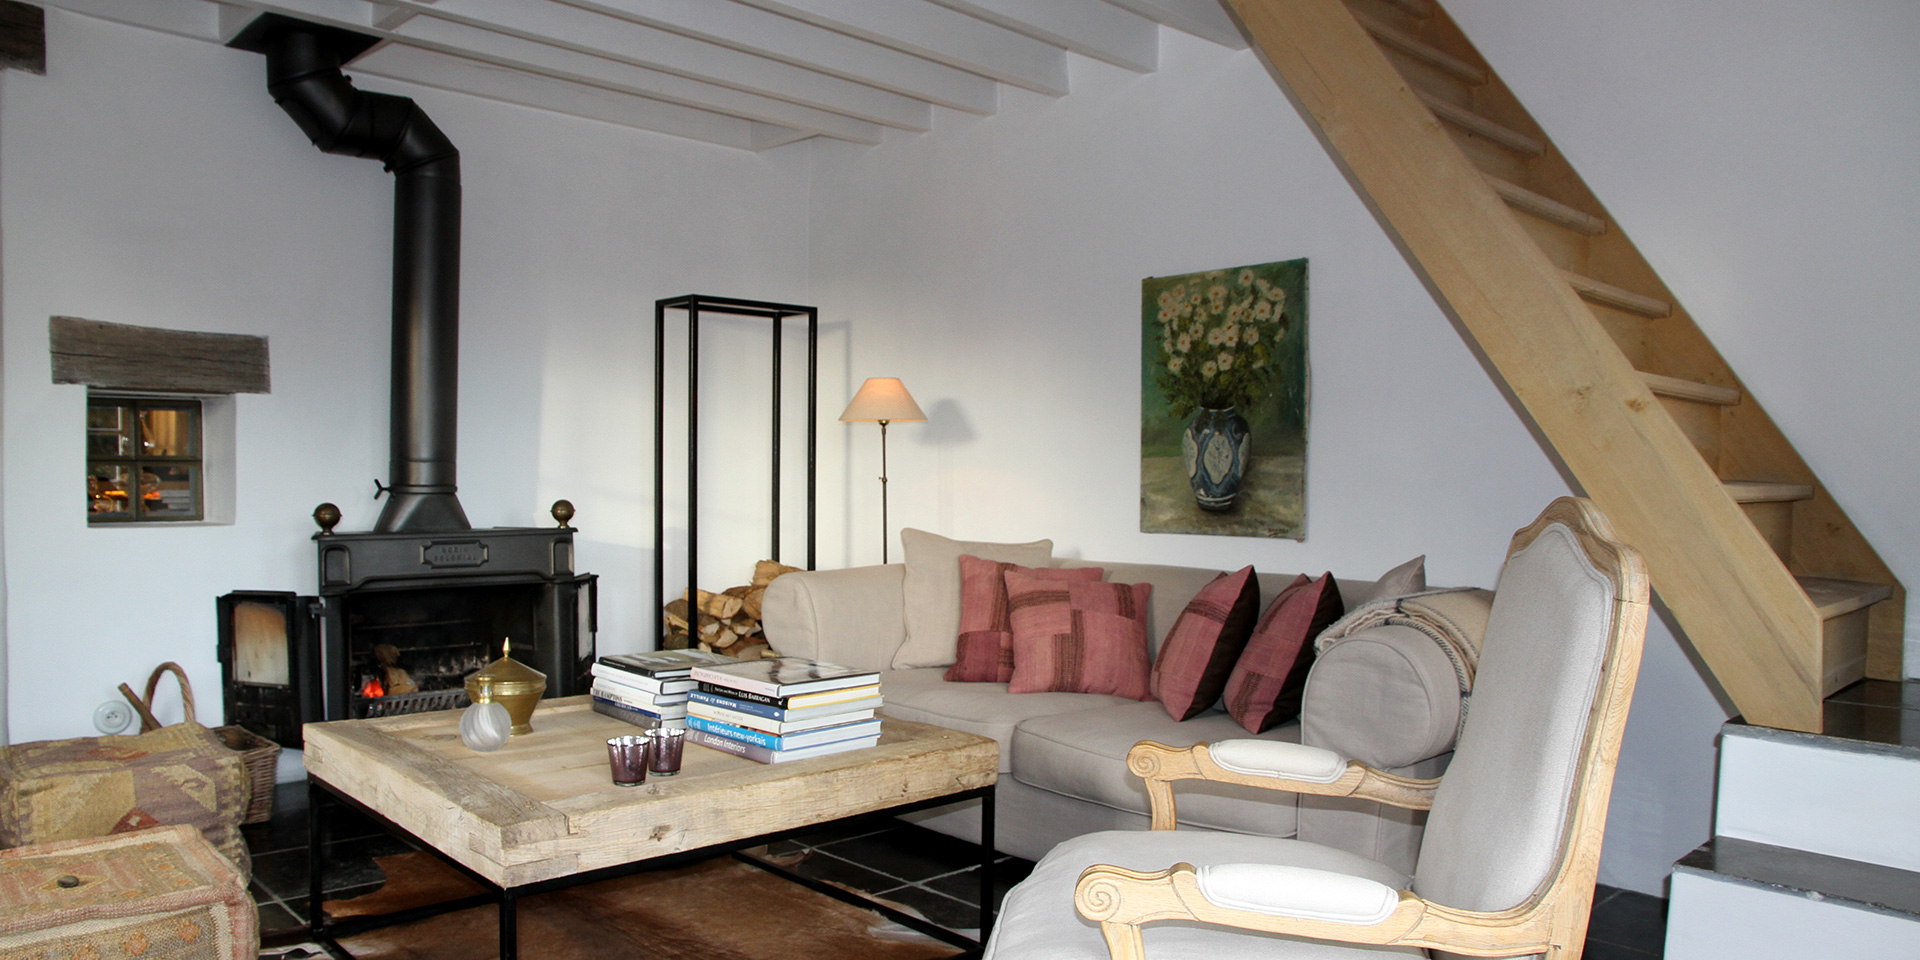 Indeling - Le cottage d'Ollomont